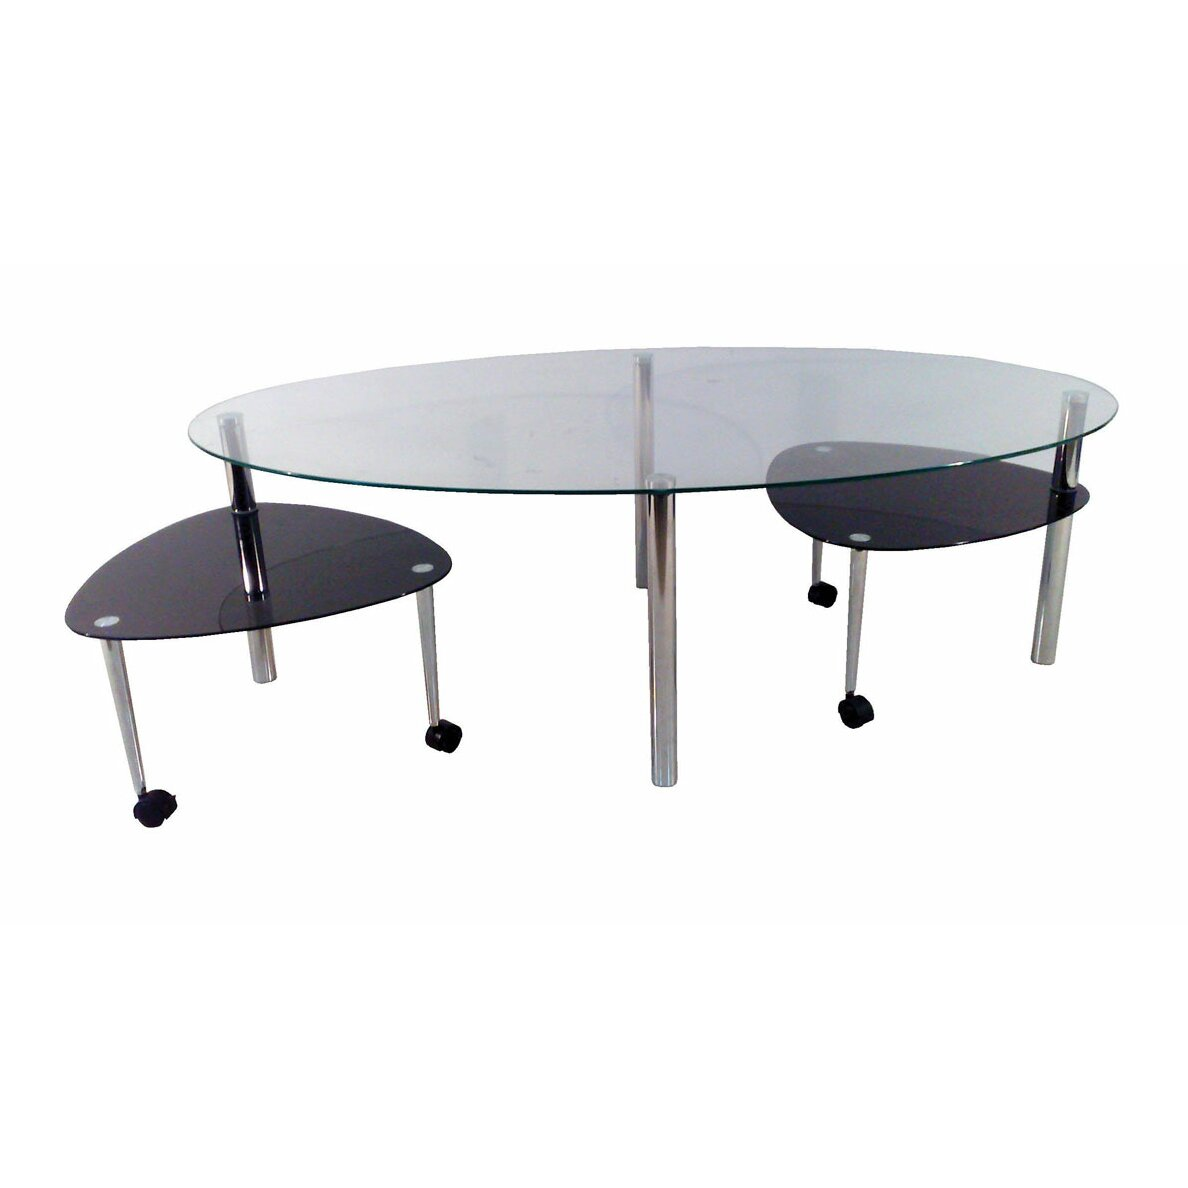 Wayfair Glass Coffee Table Uk: Premier Housewares Treviso Coffee Table